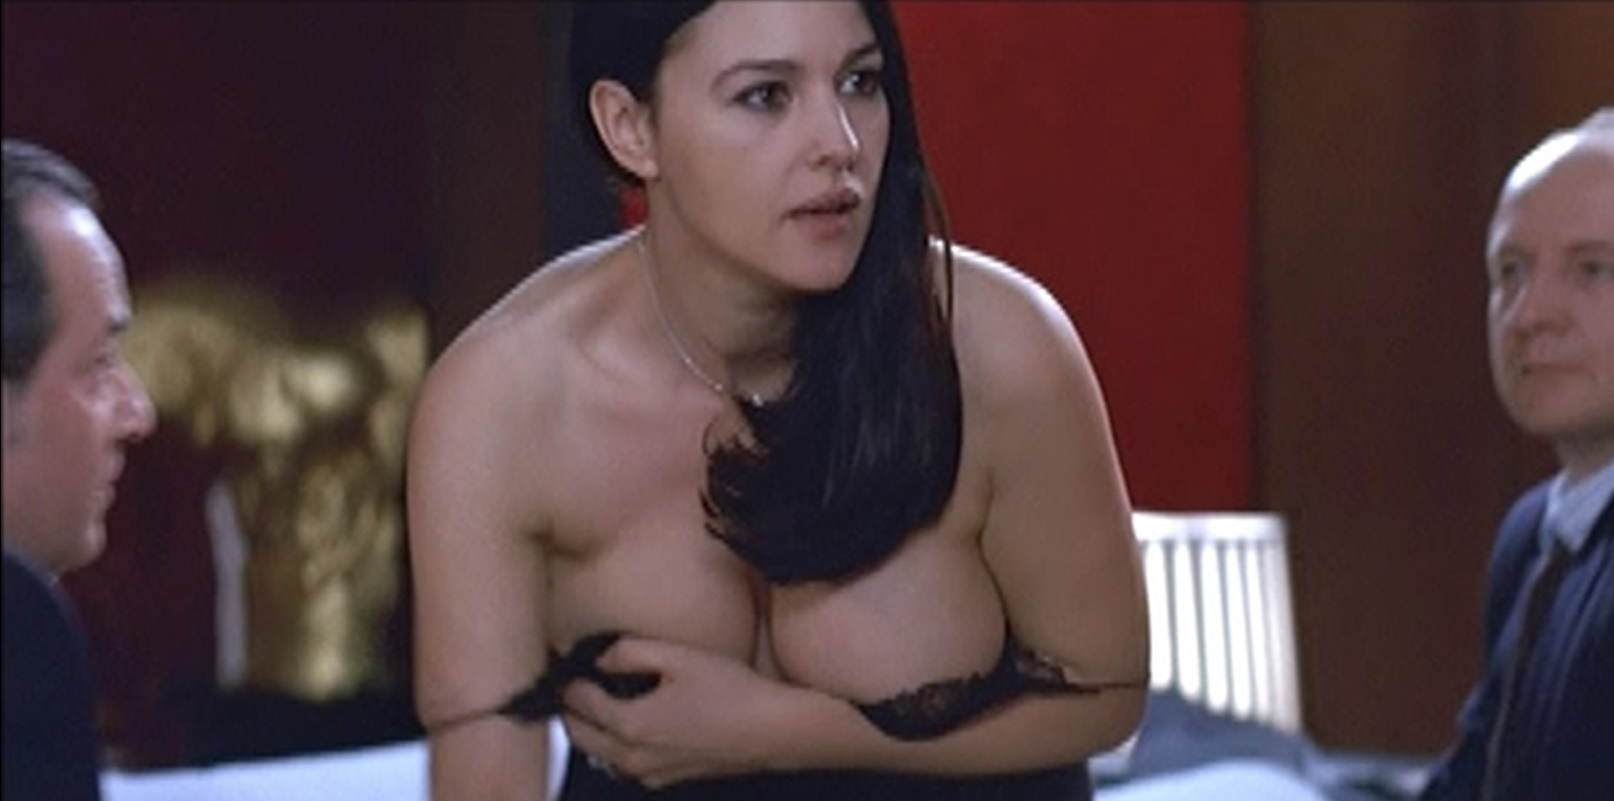 Diane franklin in the last american virgin scandalplanetcom - 1 part 5